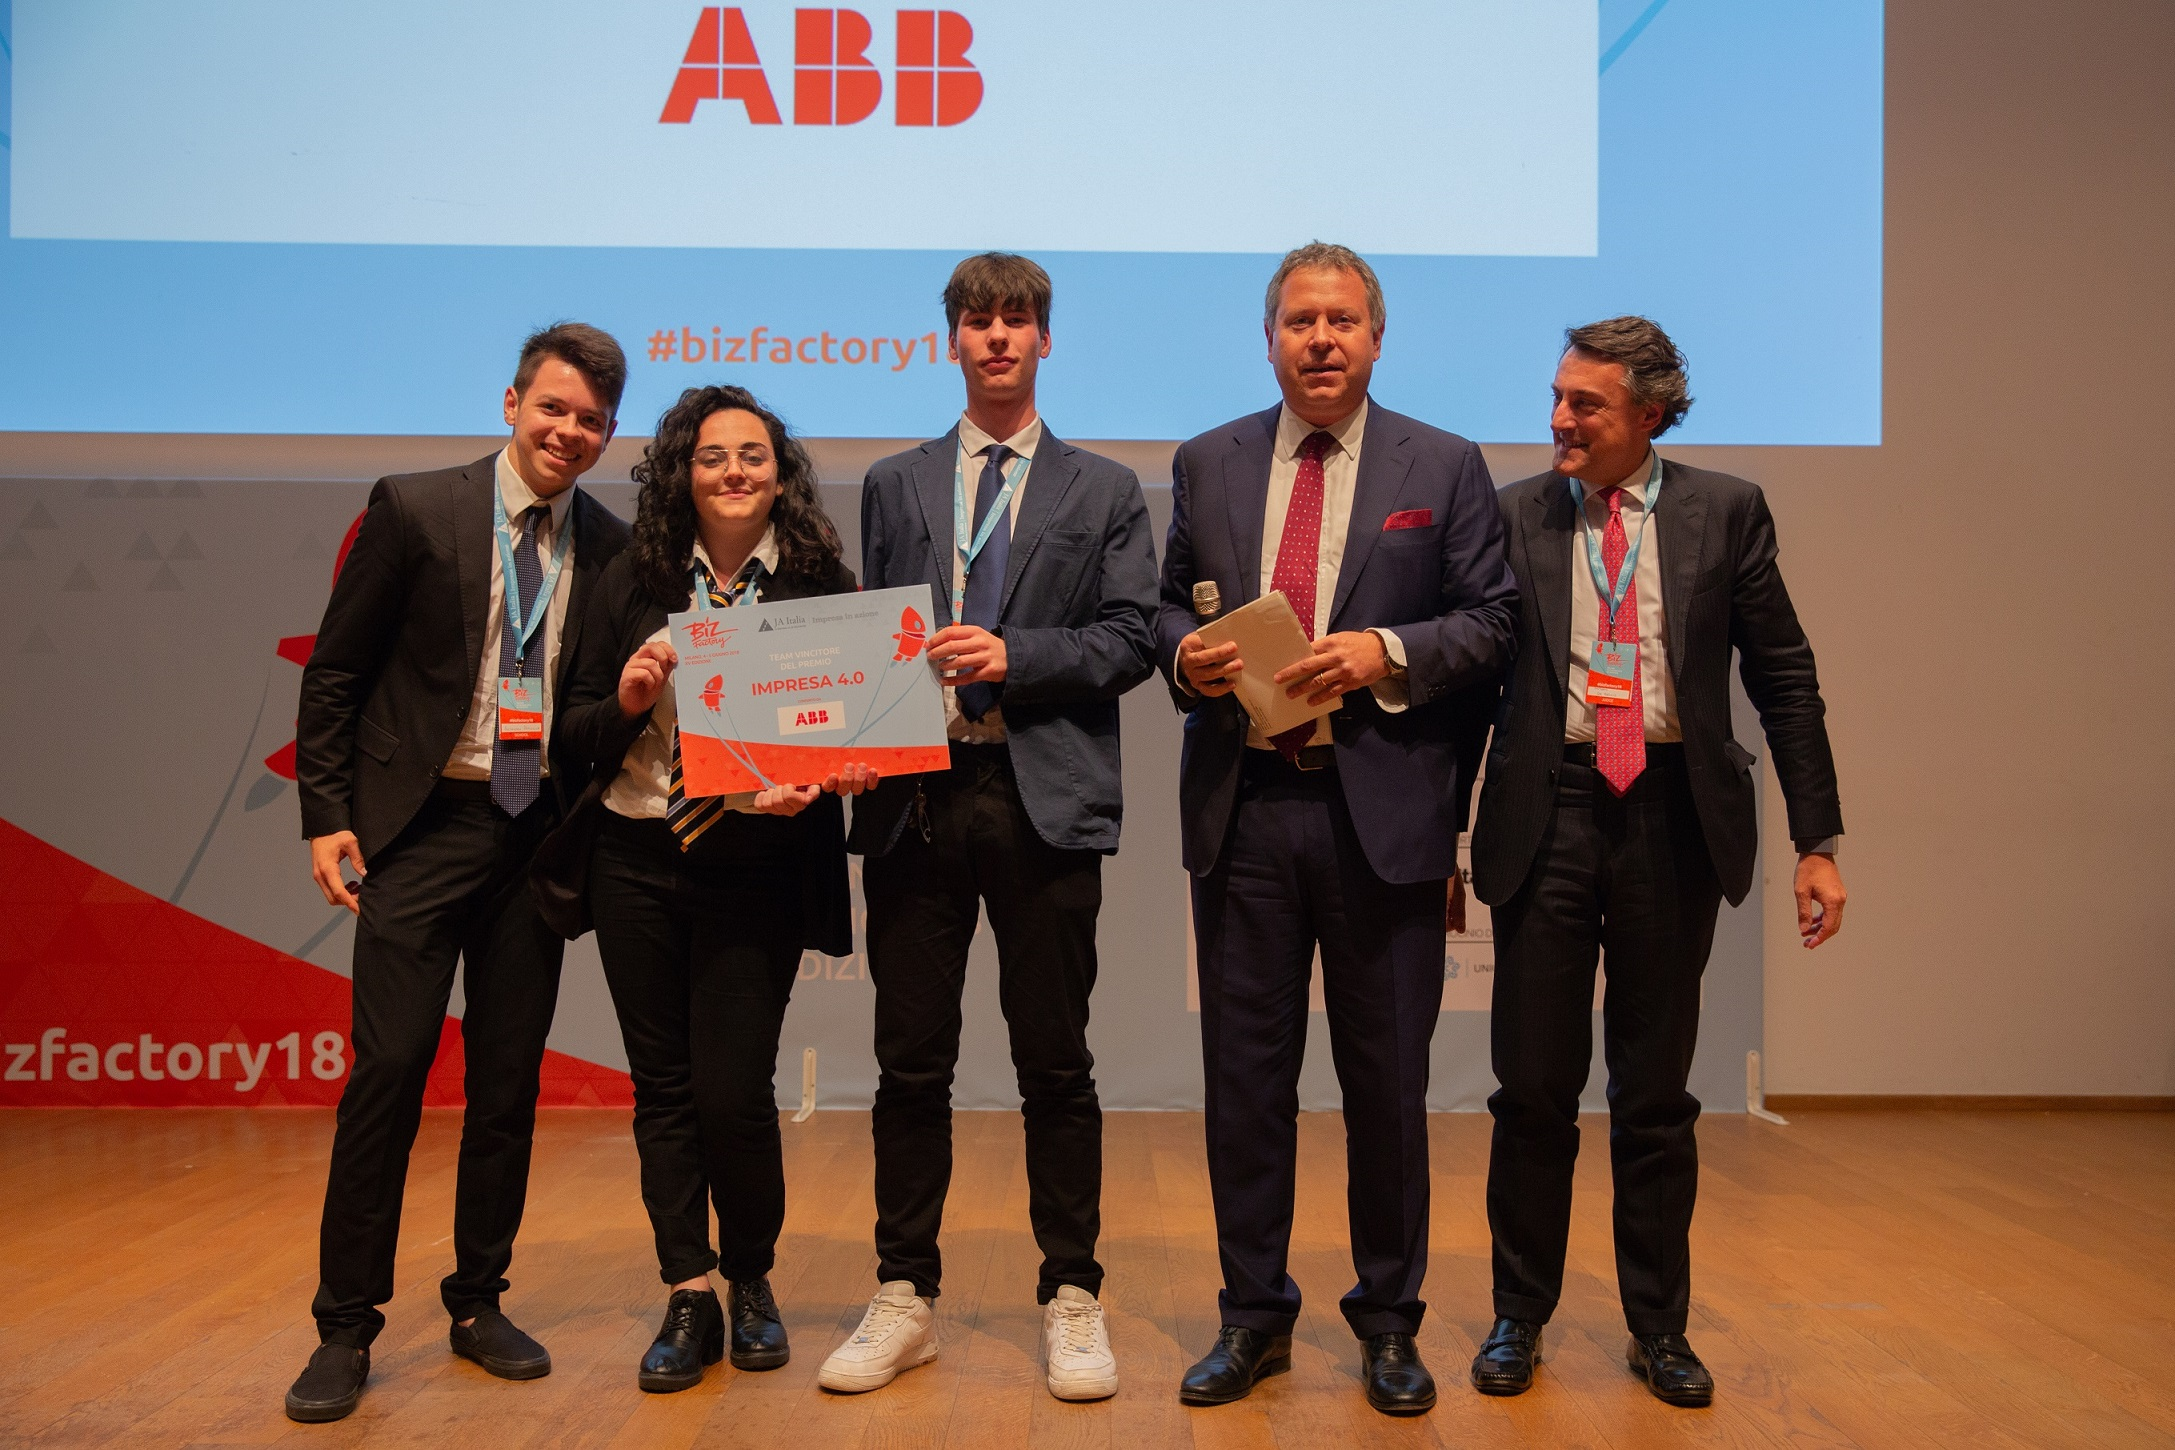 Premio Impresa 4.0: studenti diventano imprenditori digitali thumbnail